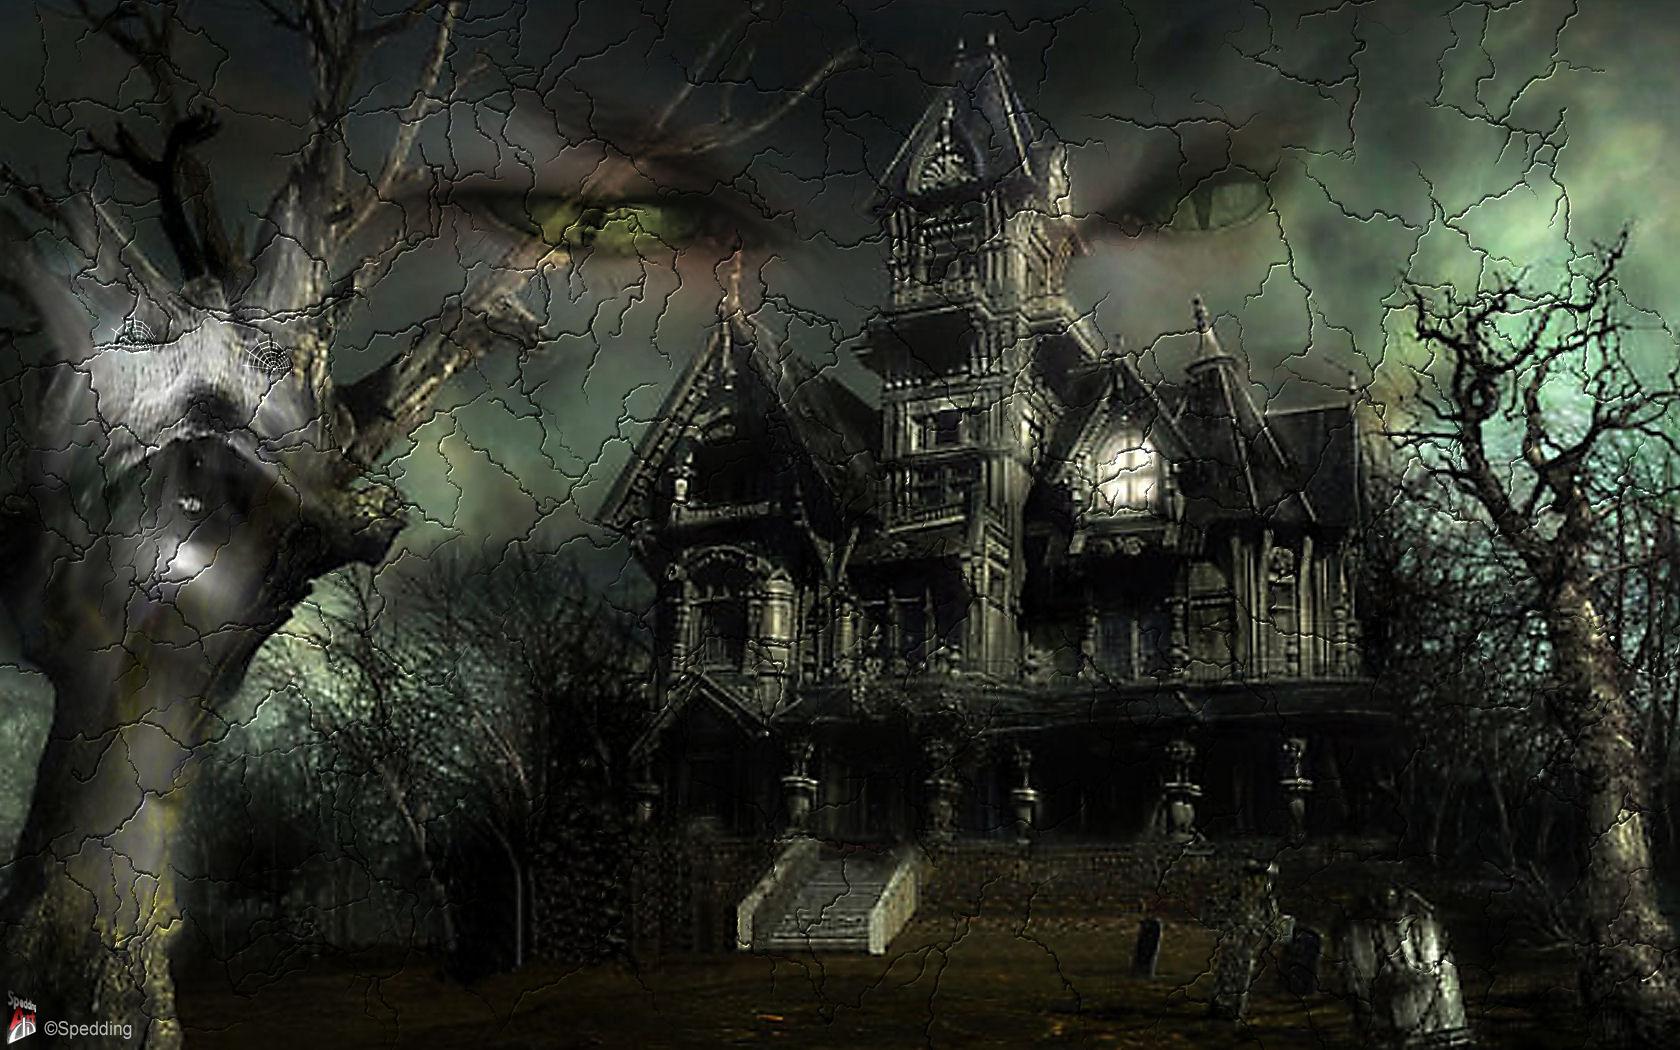 Halloween Spooky Wallpaper.50 Desktop Halloween Scary Wallpaper On Wallpapersafari